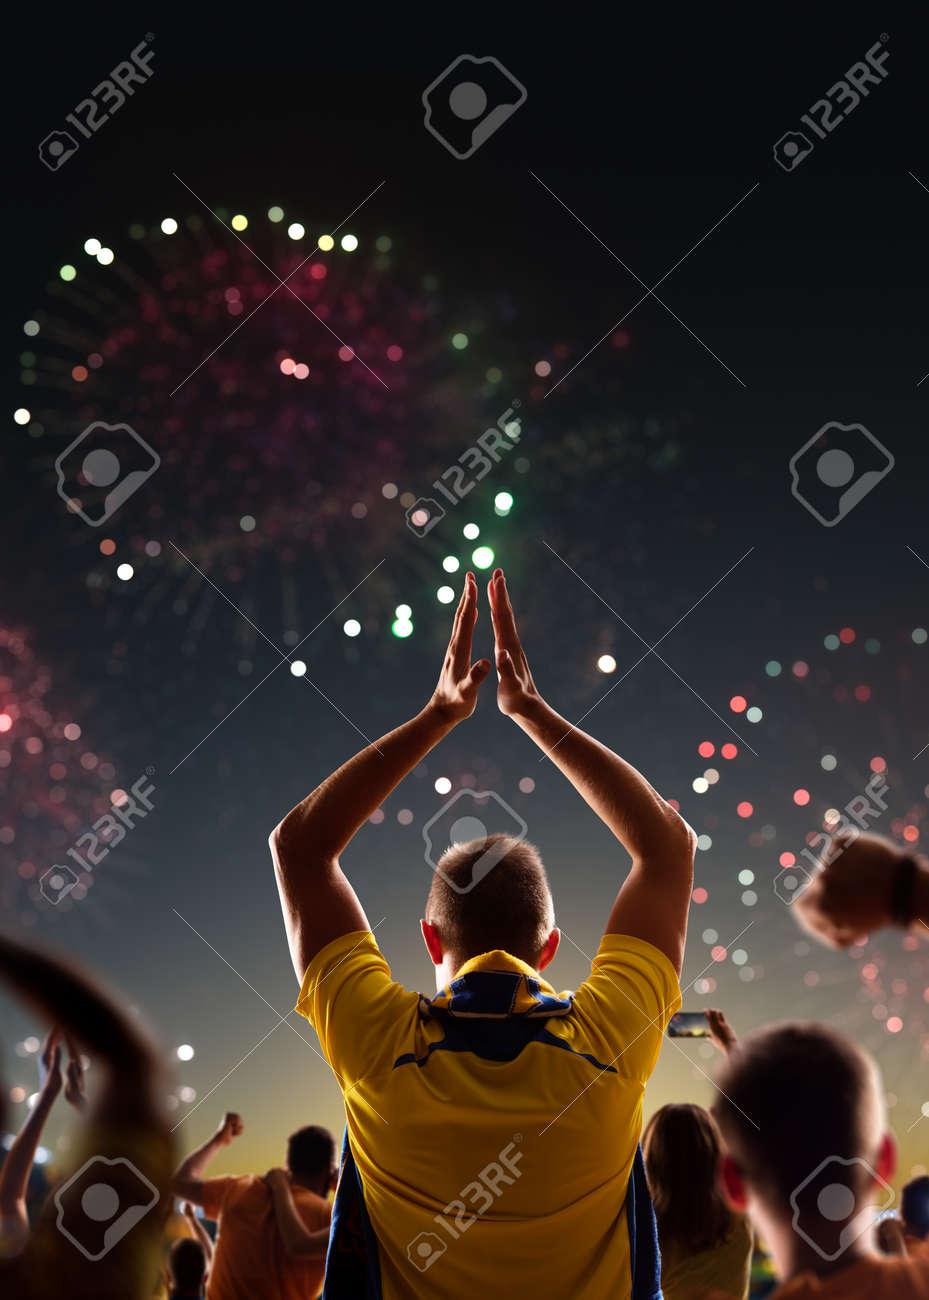 Fans celebrate in Stadium Arena night fireworks - 157252500